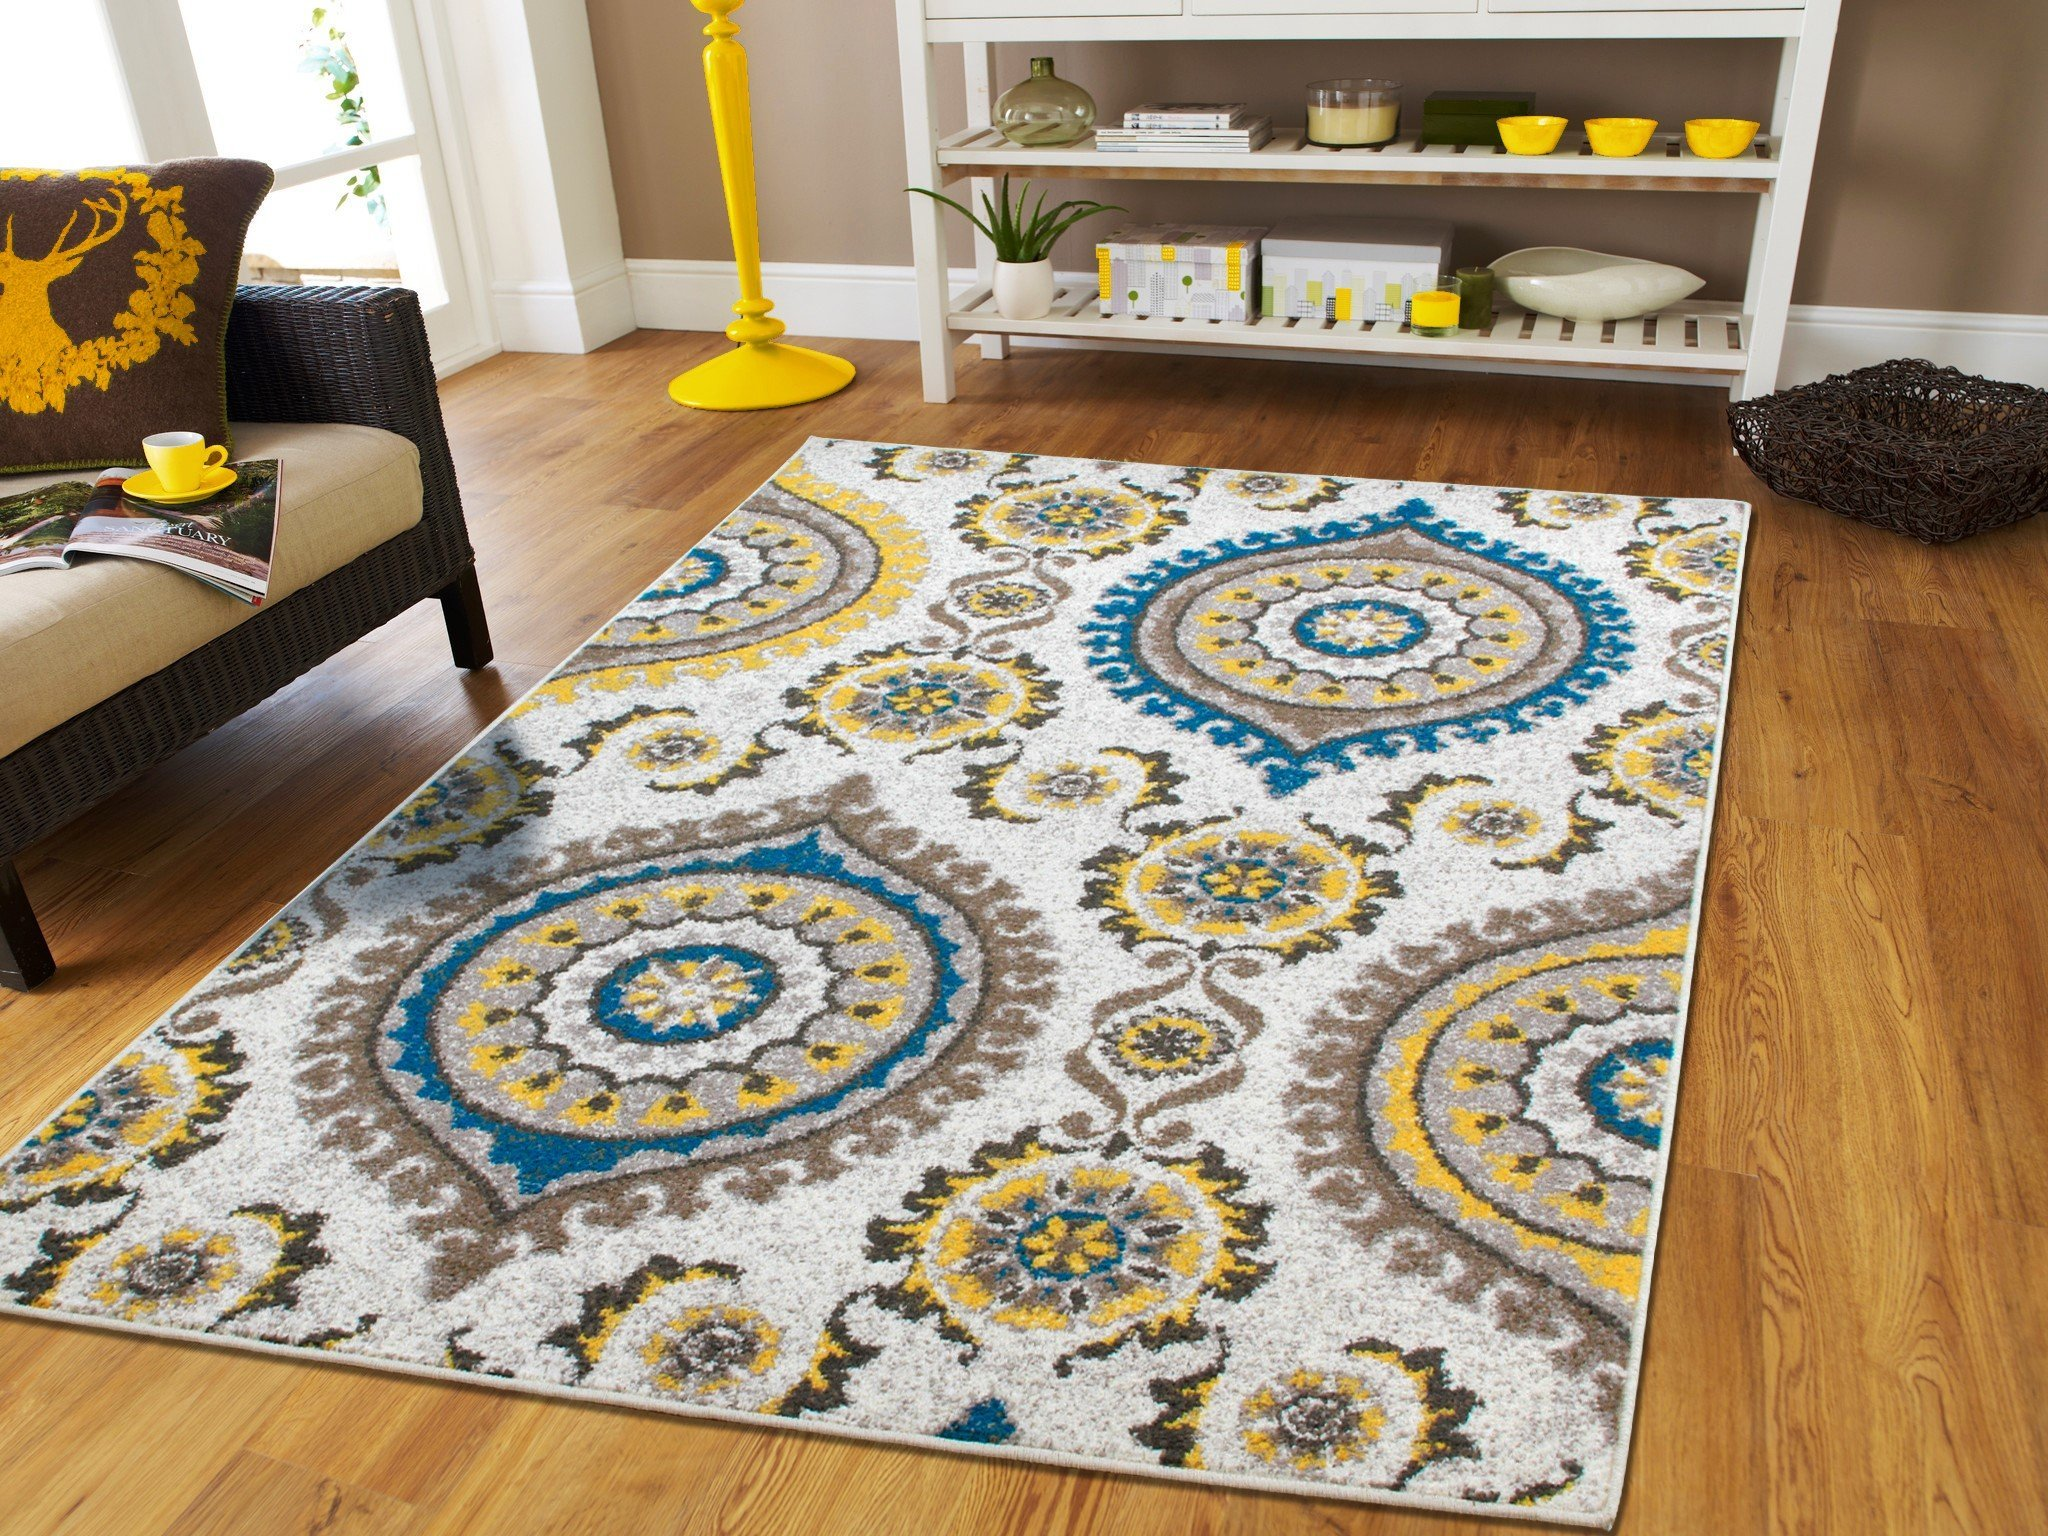 New modern floor rugs for living room large area rugs blue gray cream modern flowers 8x11